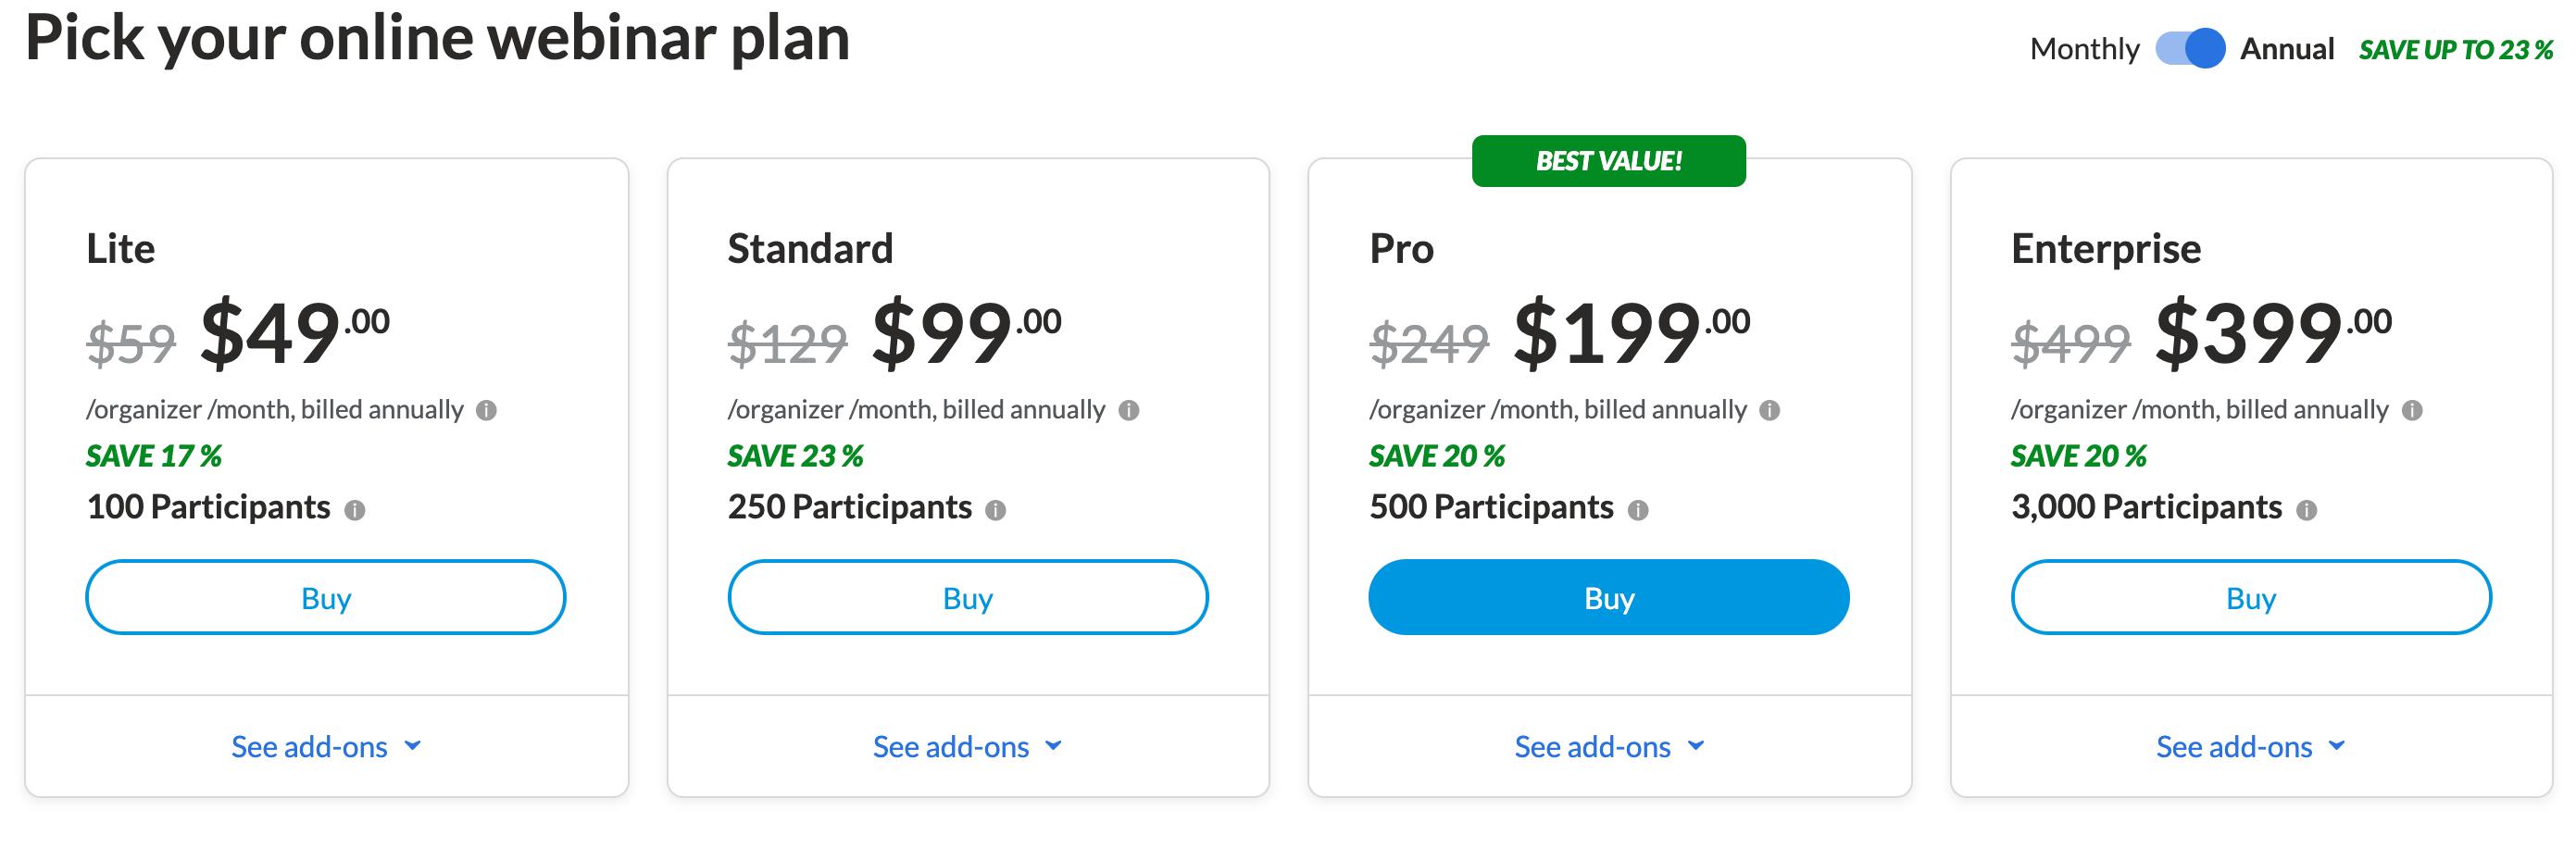 GoToWebinar Pricing Plans Discount Offer